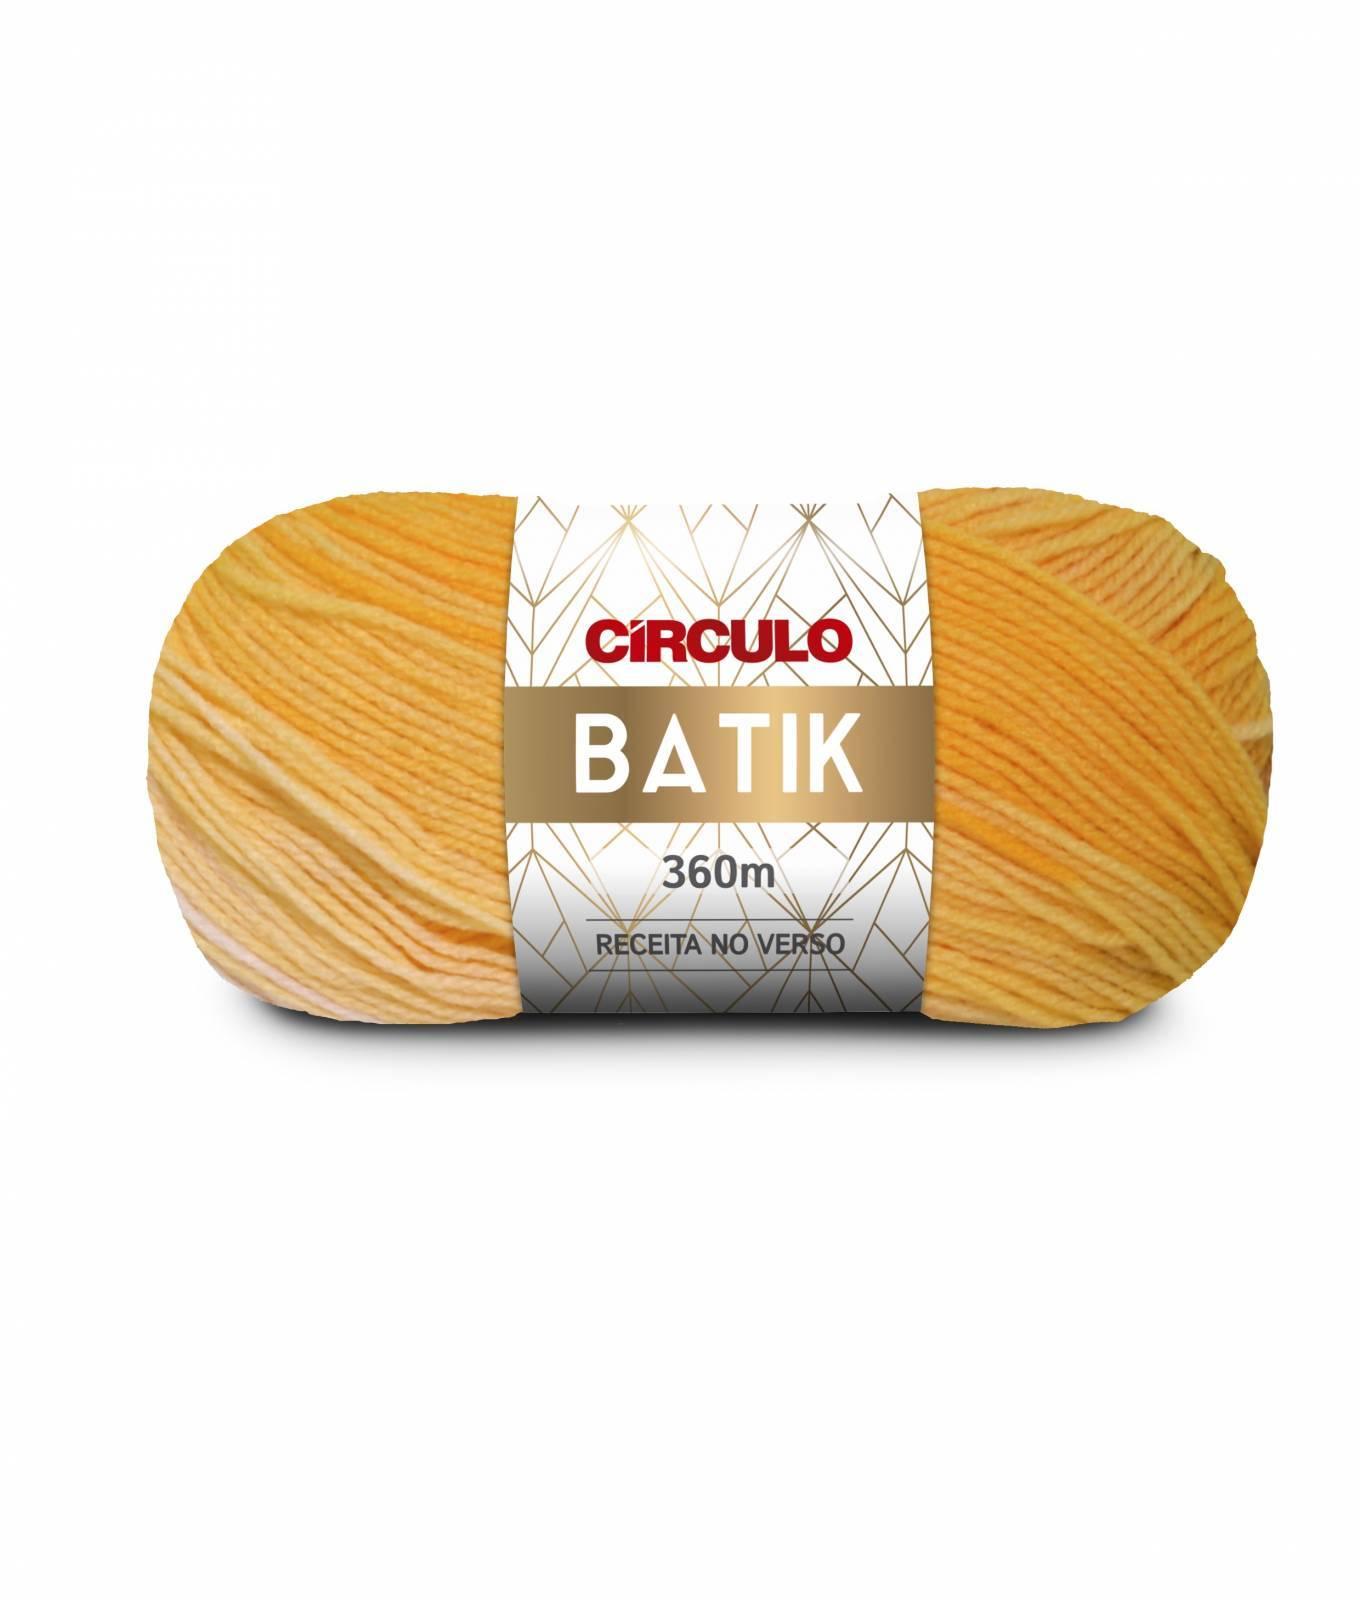 Batik 9500 - BAÚ DA VOVÓ